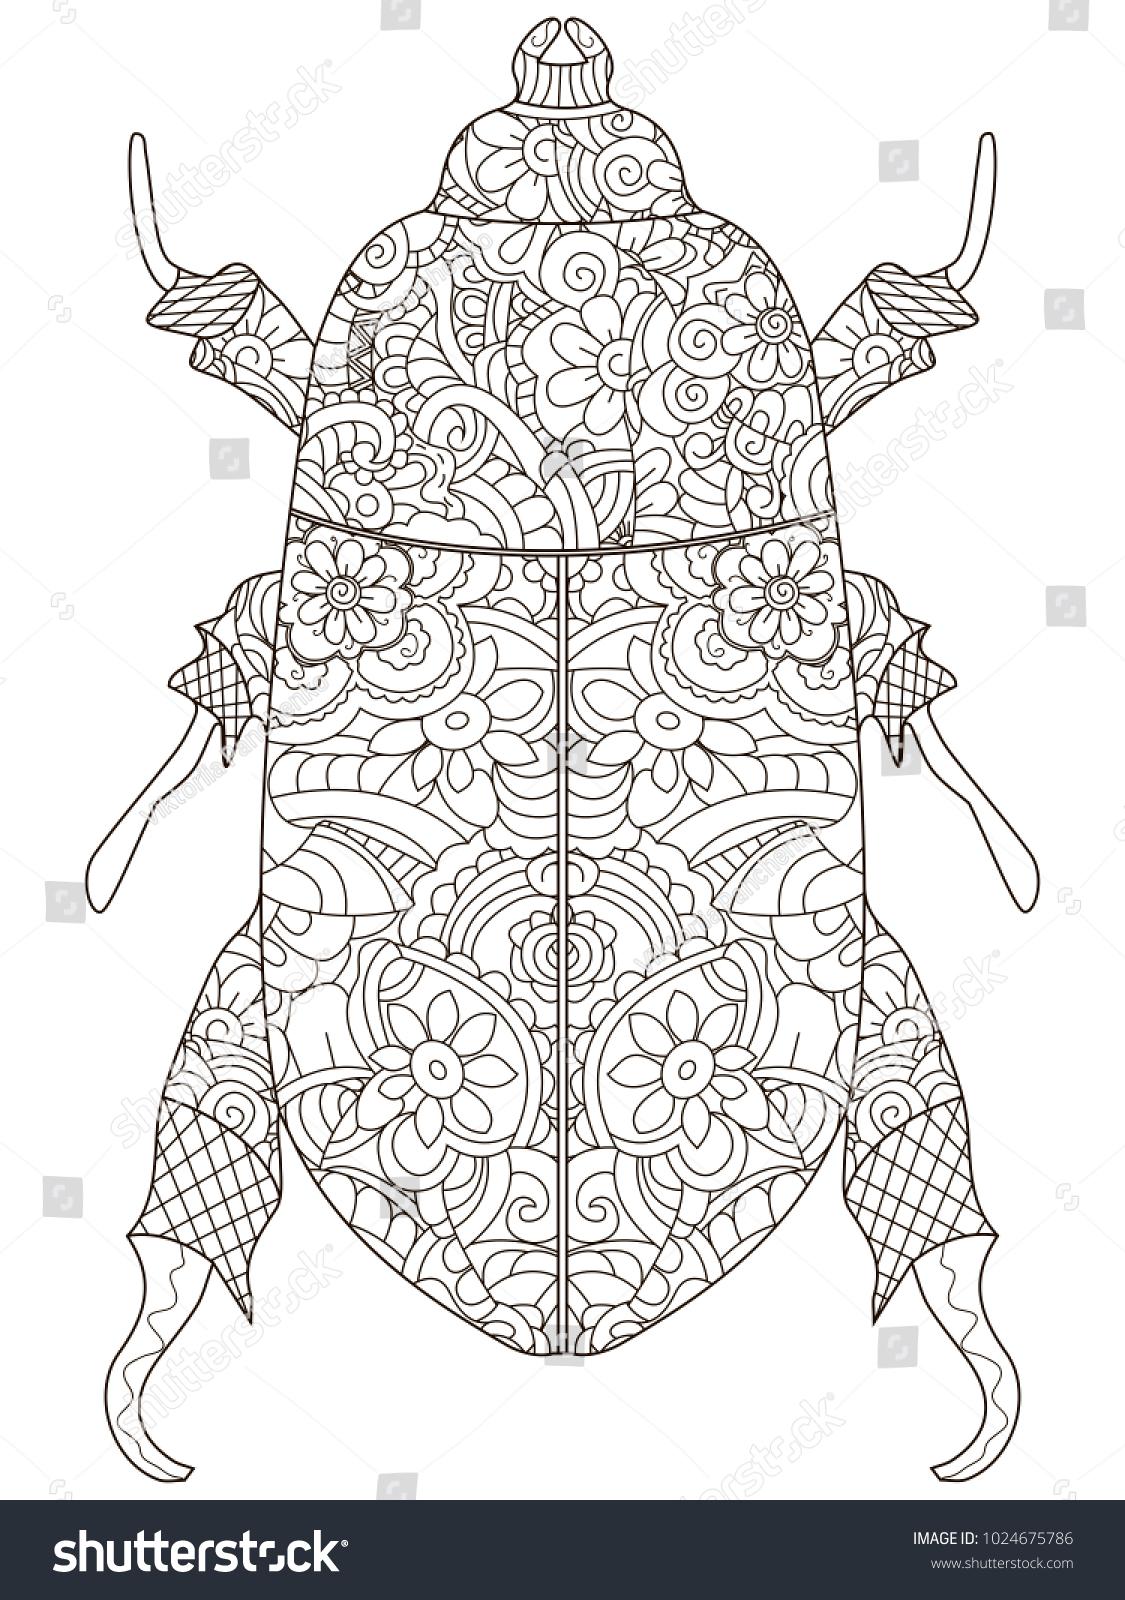 Darkling Beetle Anti Stress Coloring Book Stock Illustration 1024675786